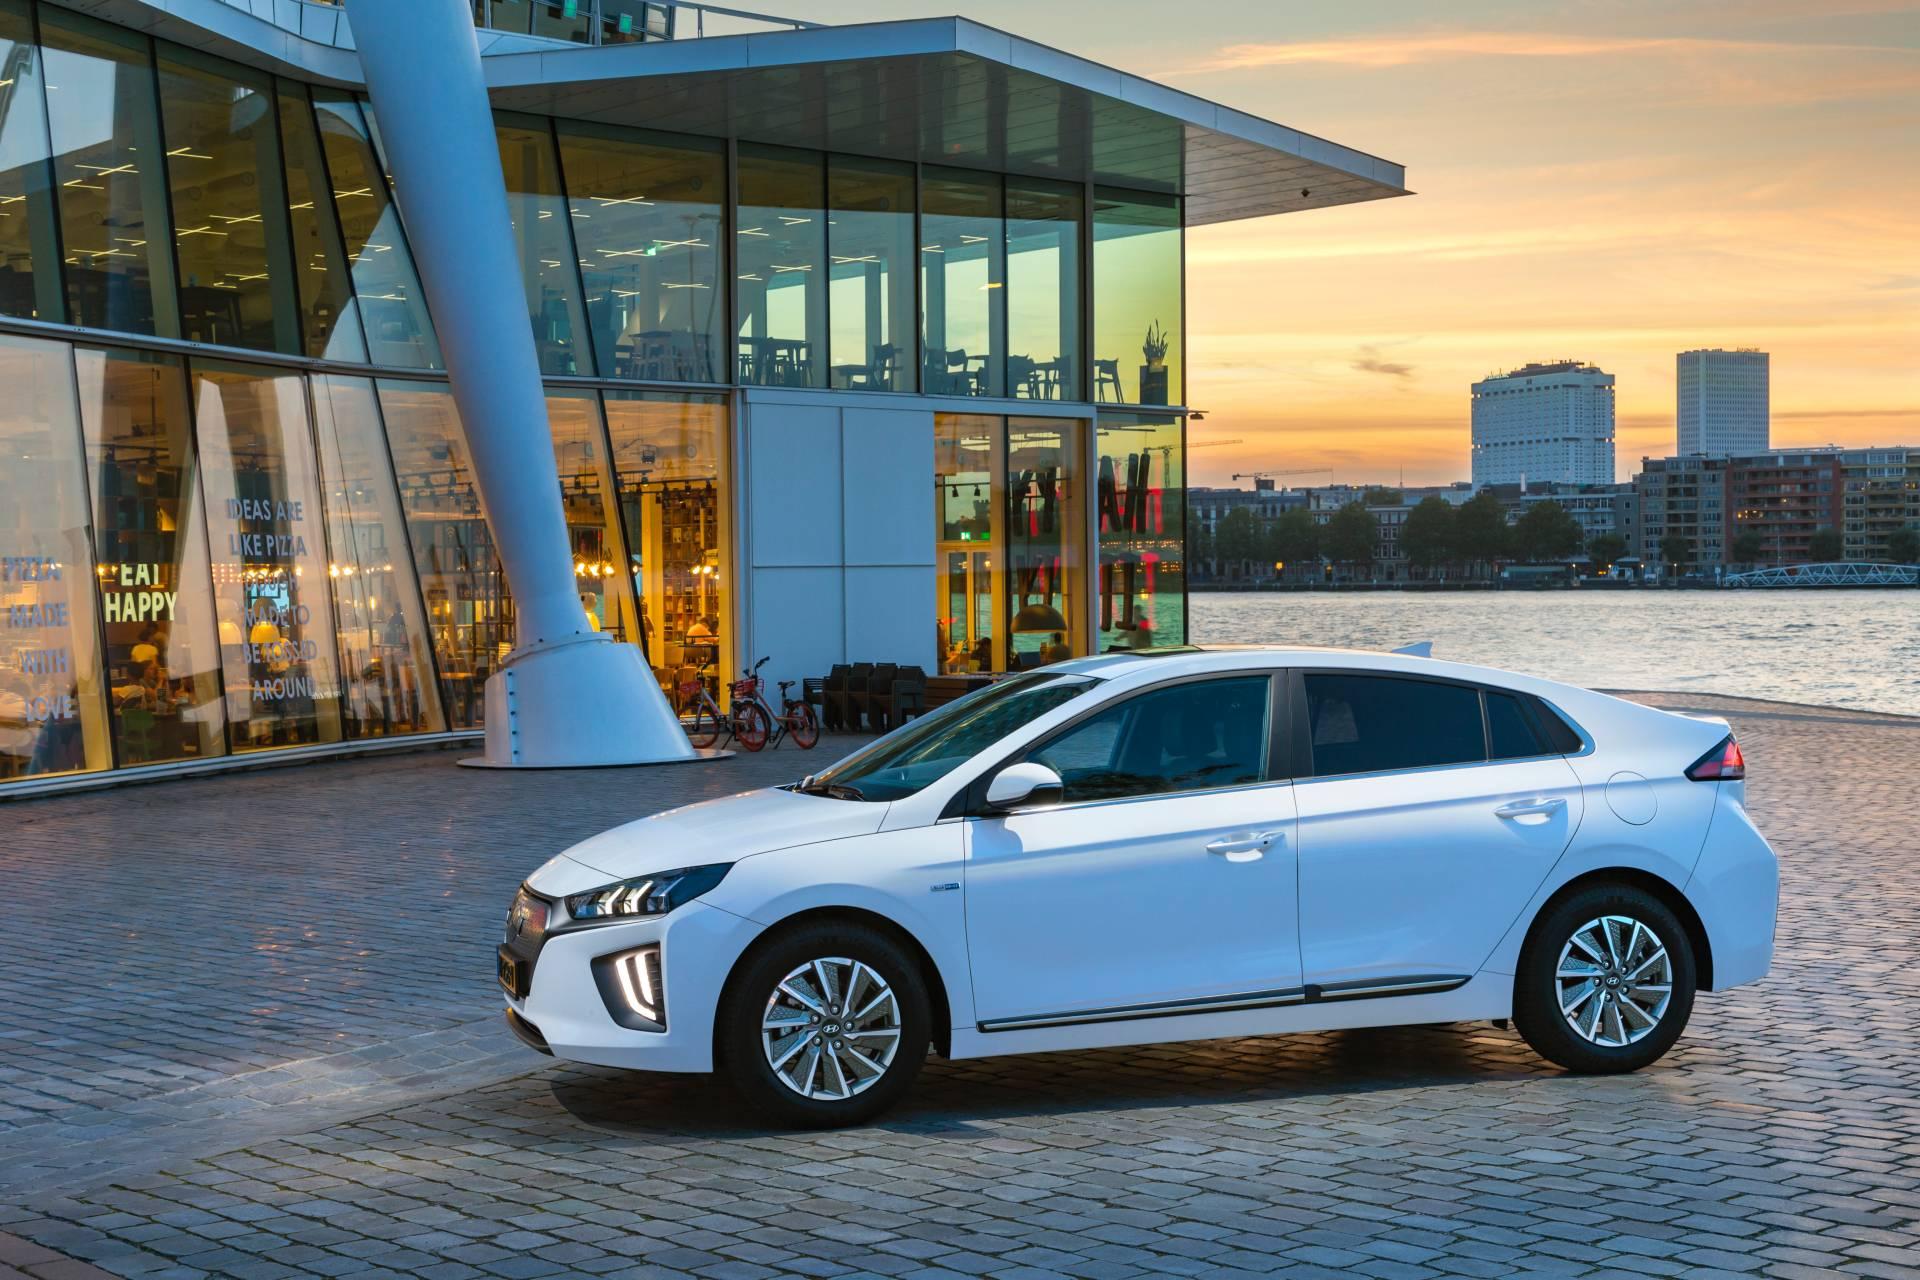 Mitsubishi Loses 1,400 Cars in Shipping Accident - autoevolution